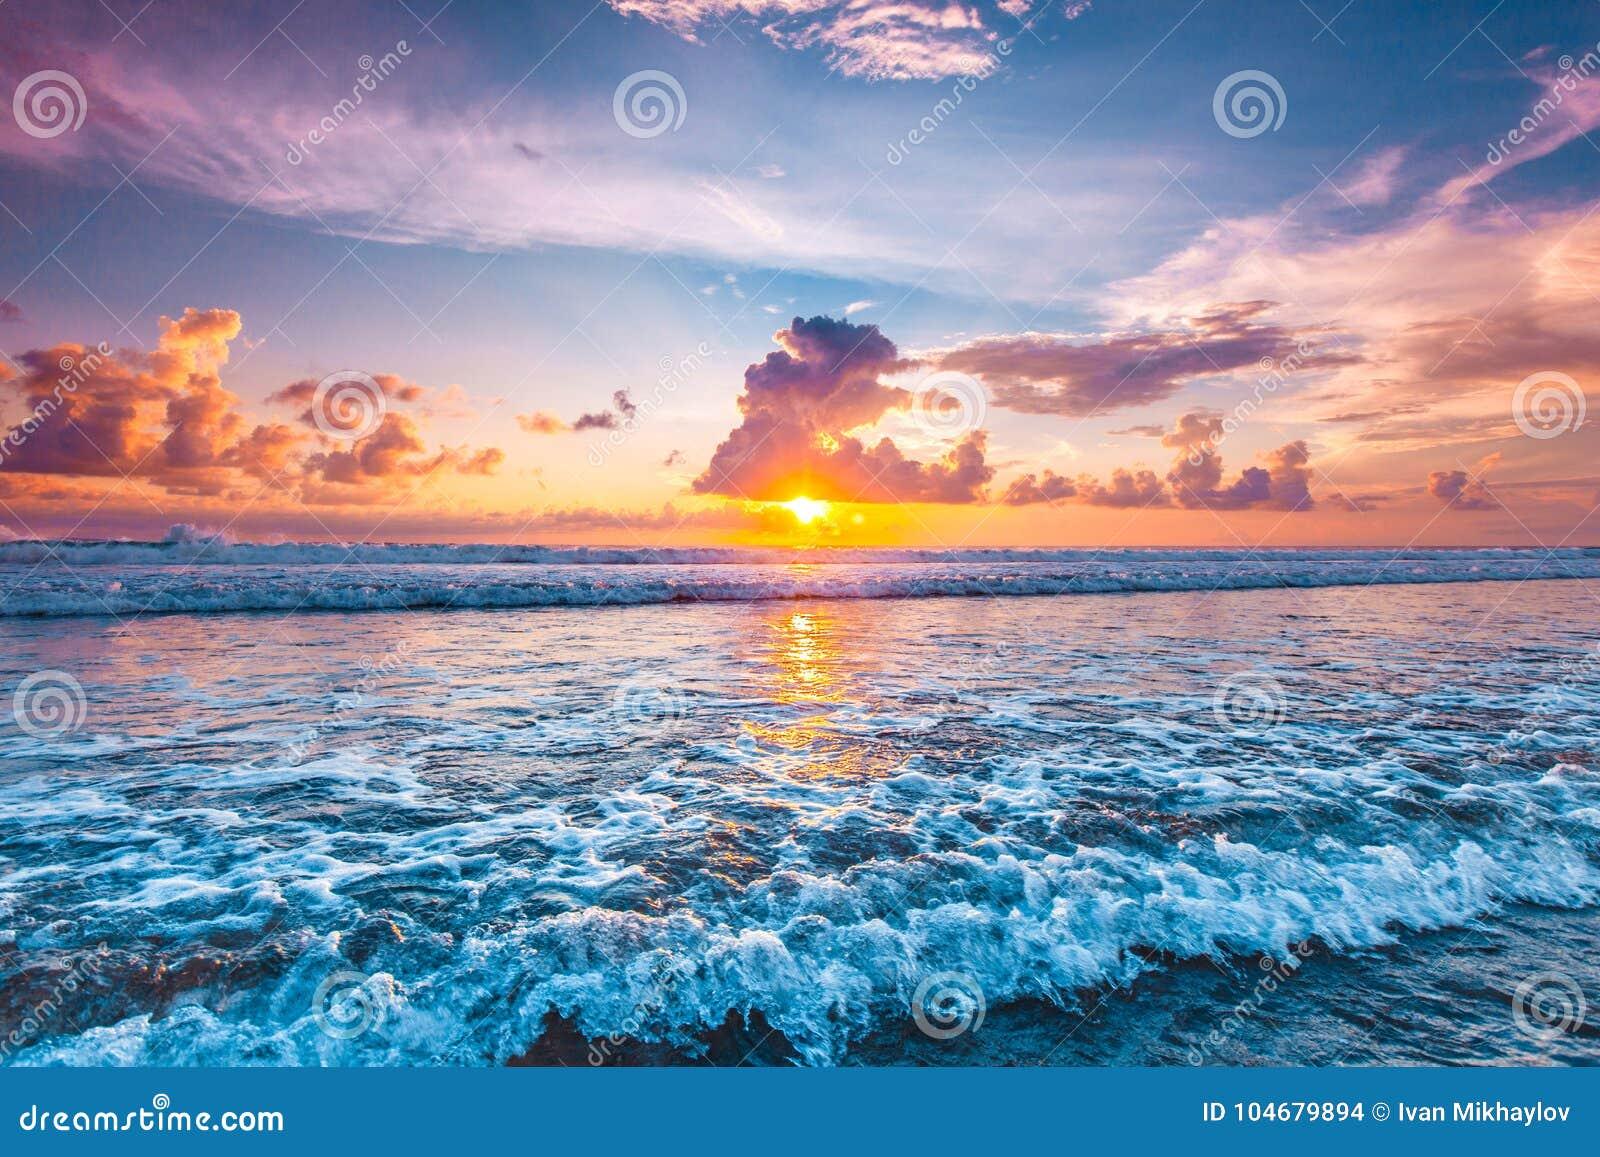 океан над заходом солнца